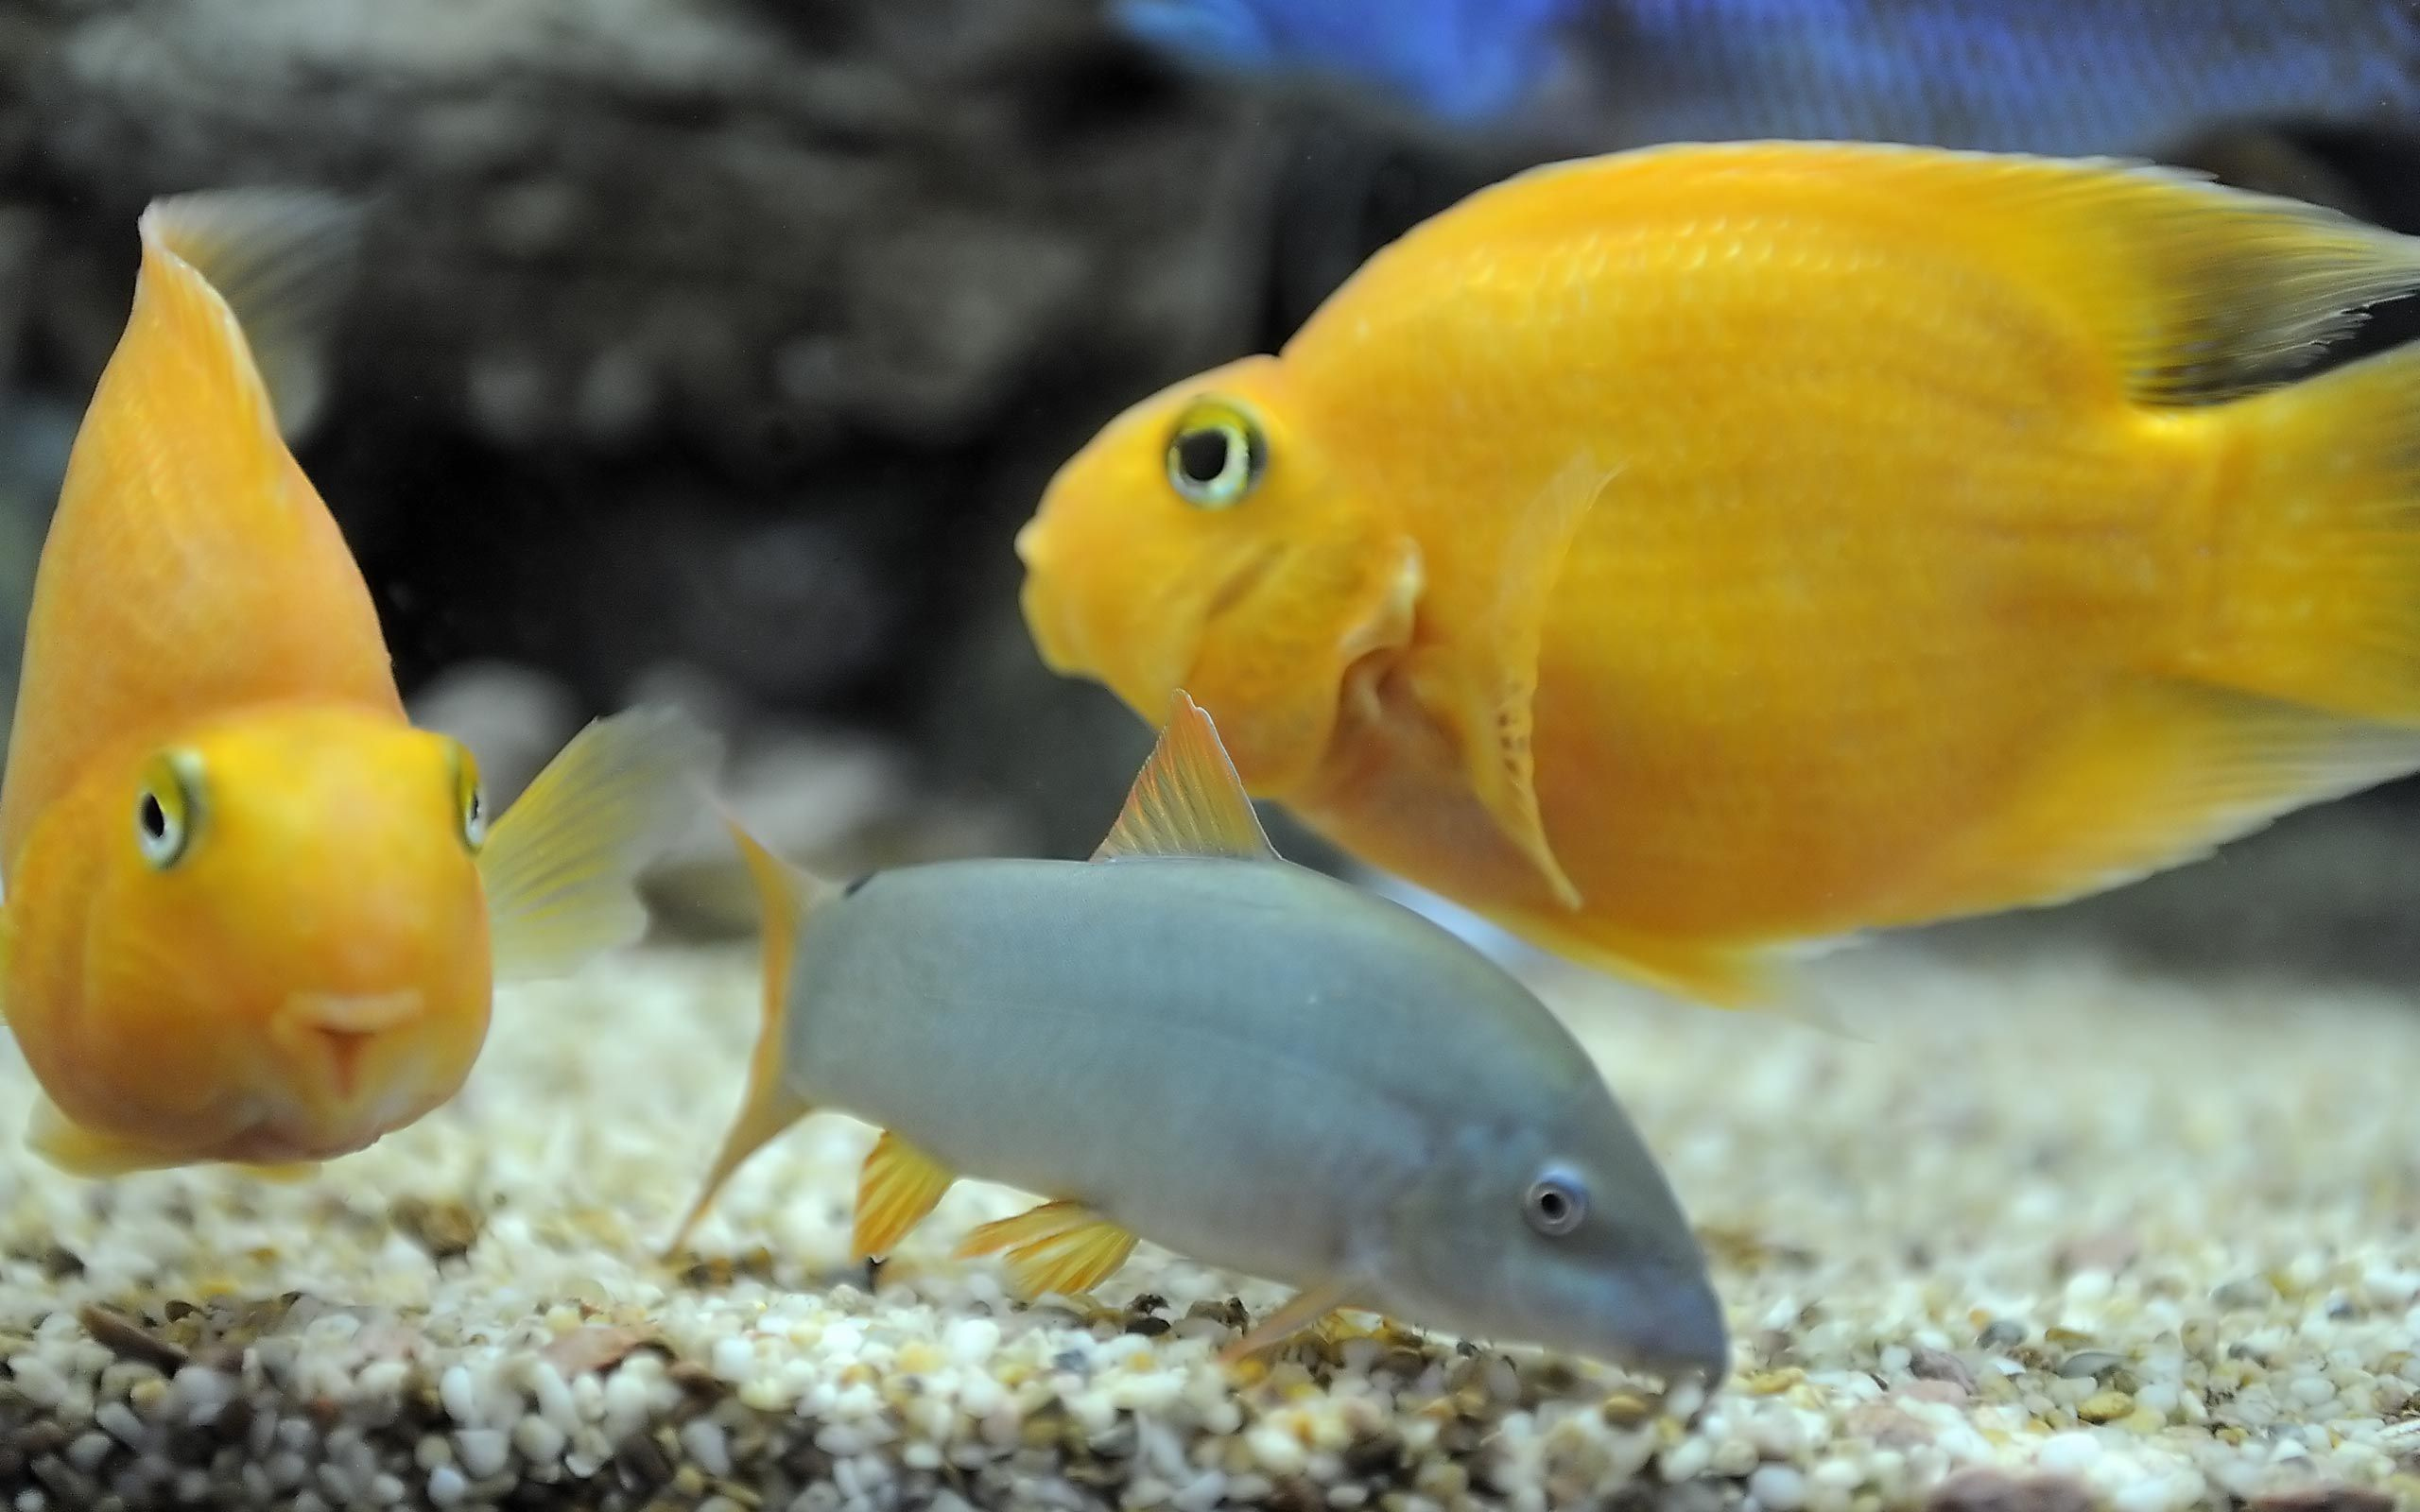 Freshwater fish for aquariums blood parrot cichlid for Fresh water aquarium fish